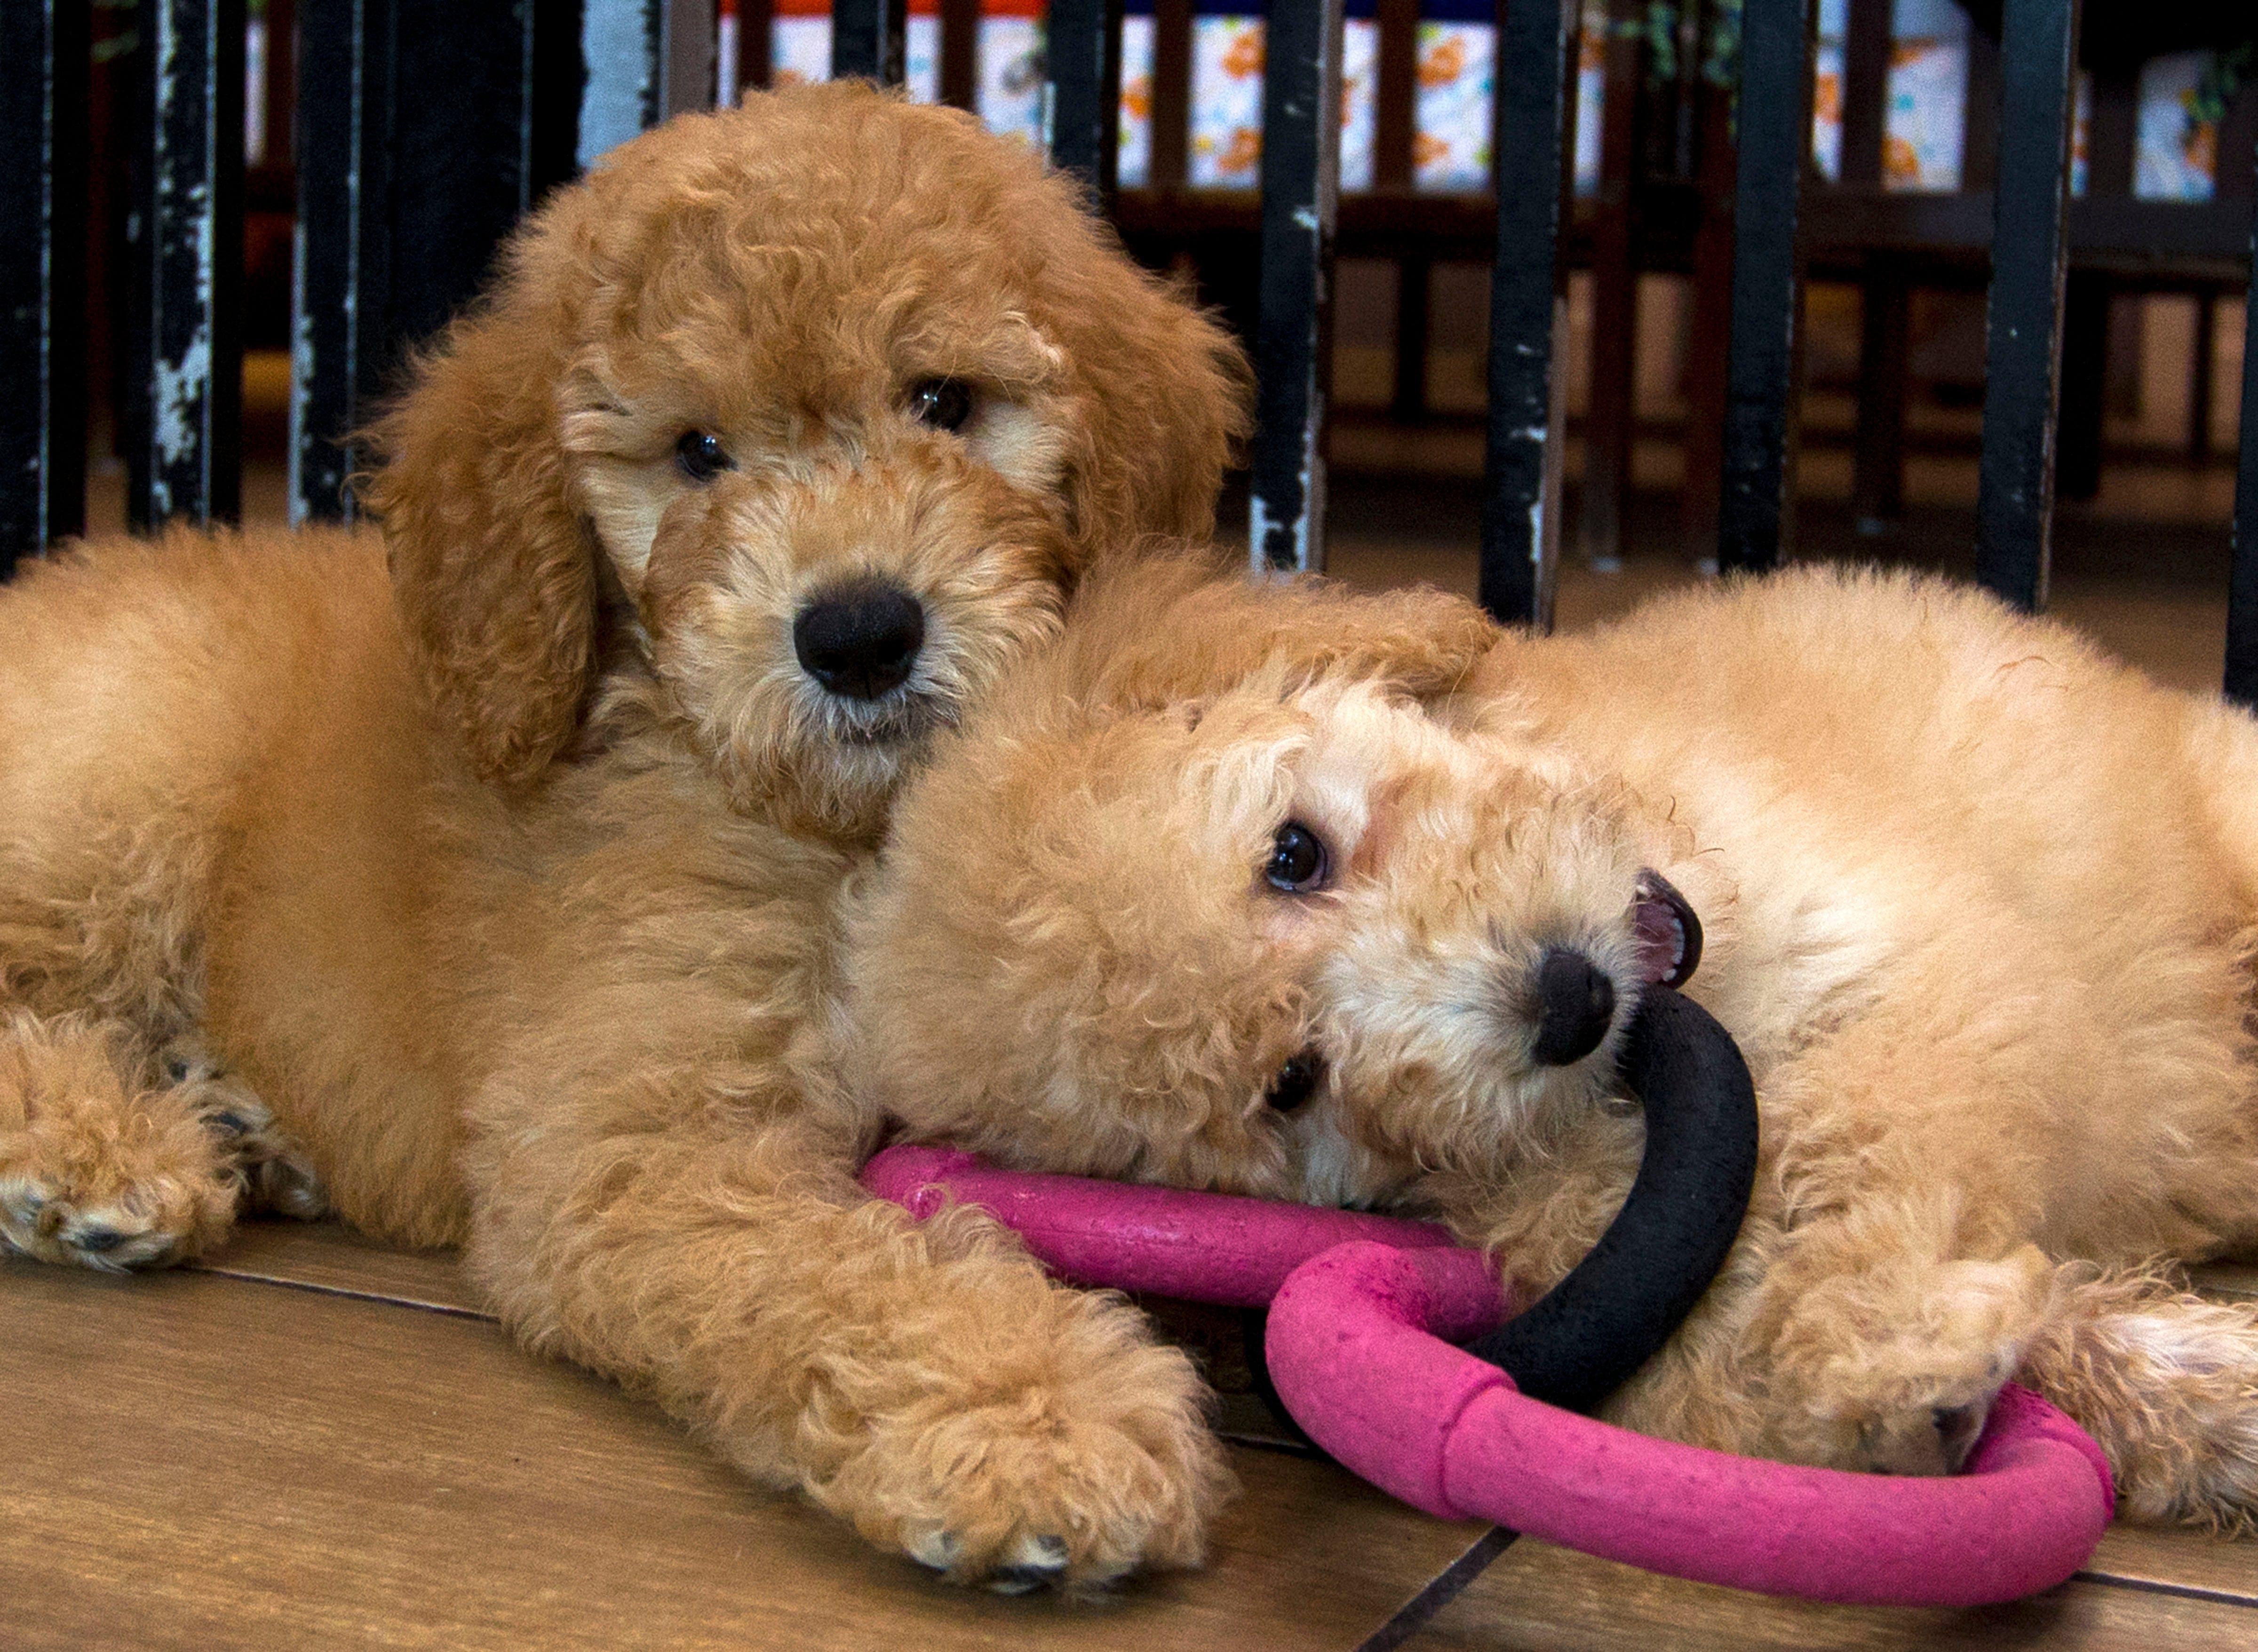 Maryland S Puppy Mills Ban Impacting Retail Pet Stores Upheld